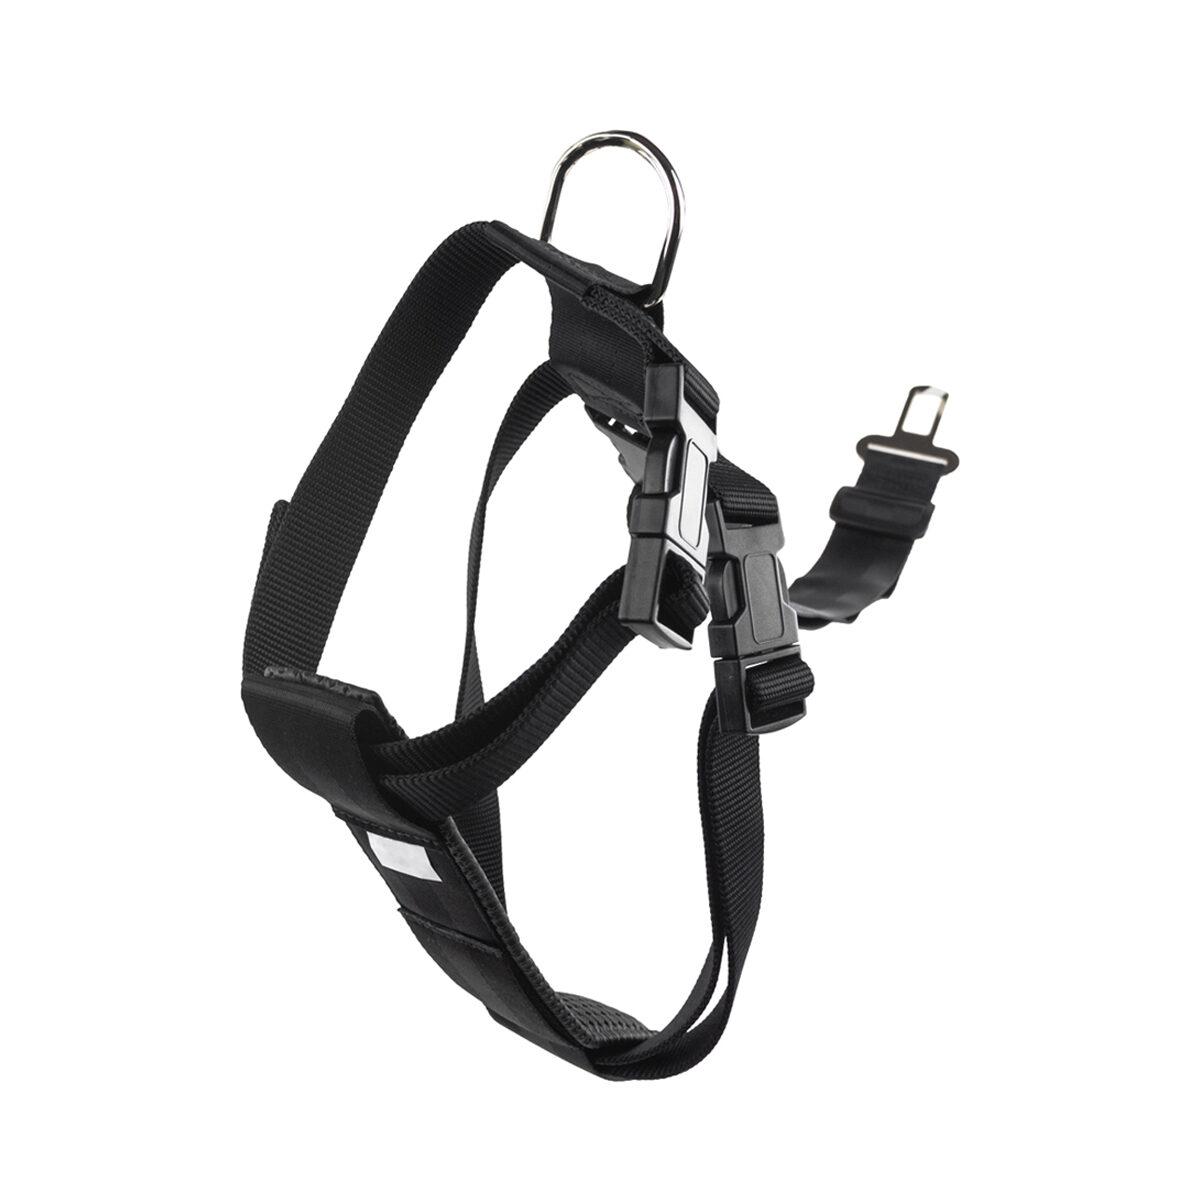 Veiligheidstuig Nylon 25mm Hondentuigje 50x70cm Zwart